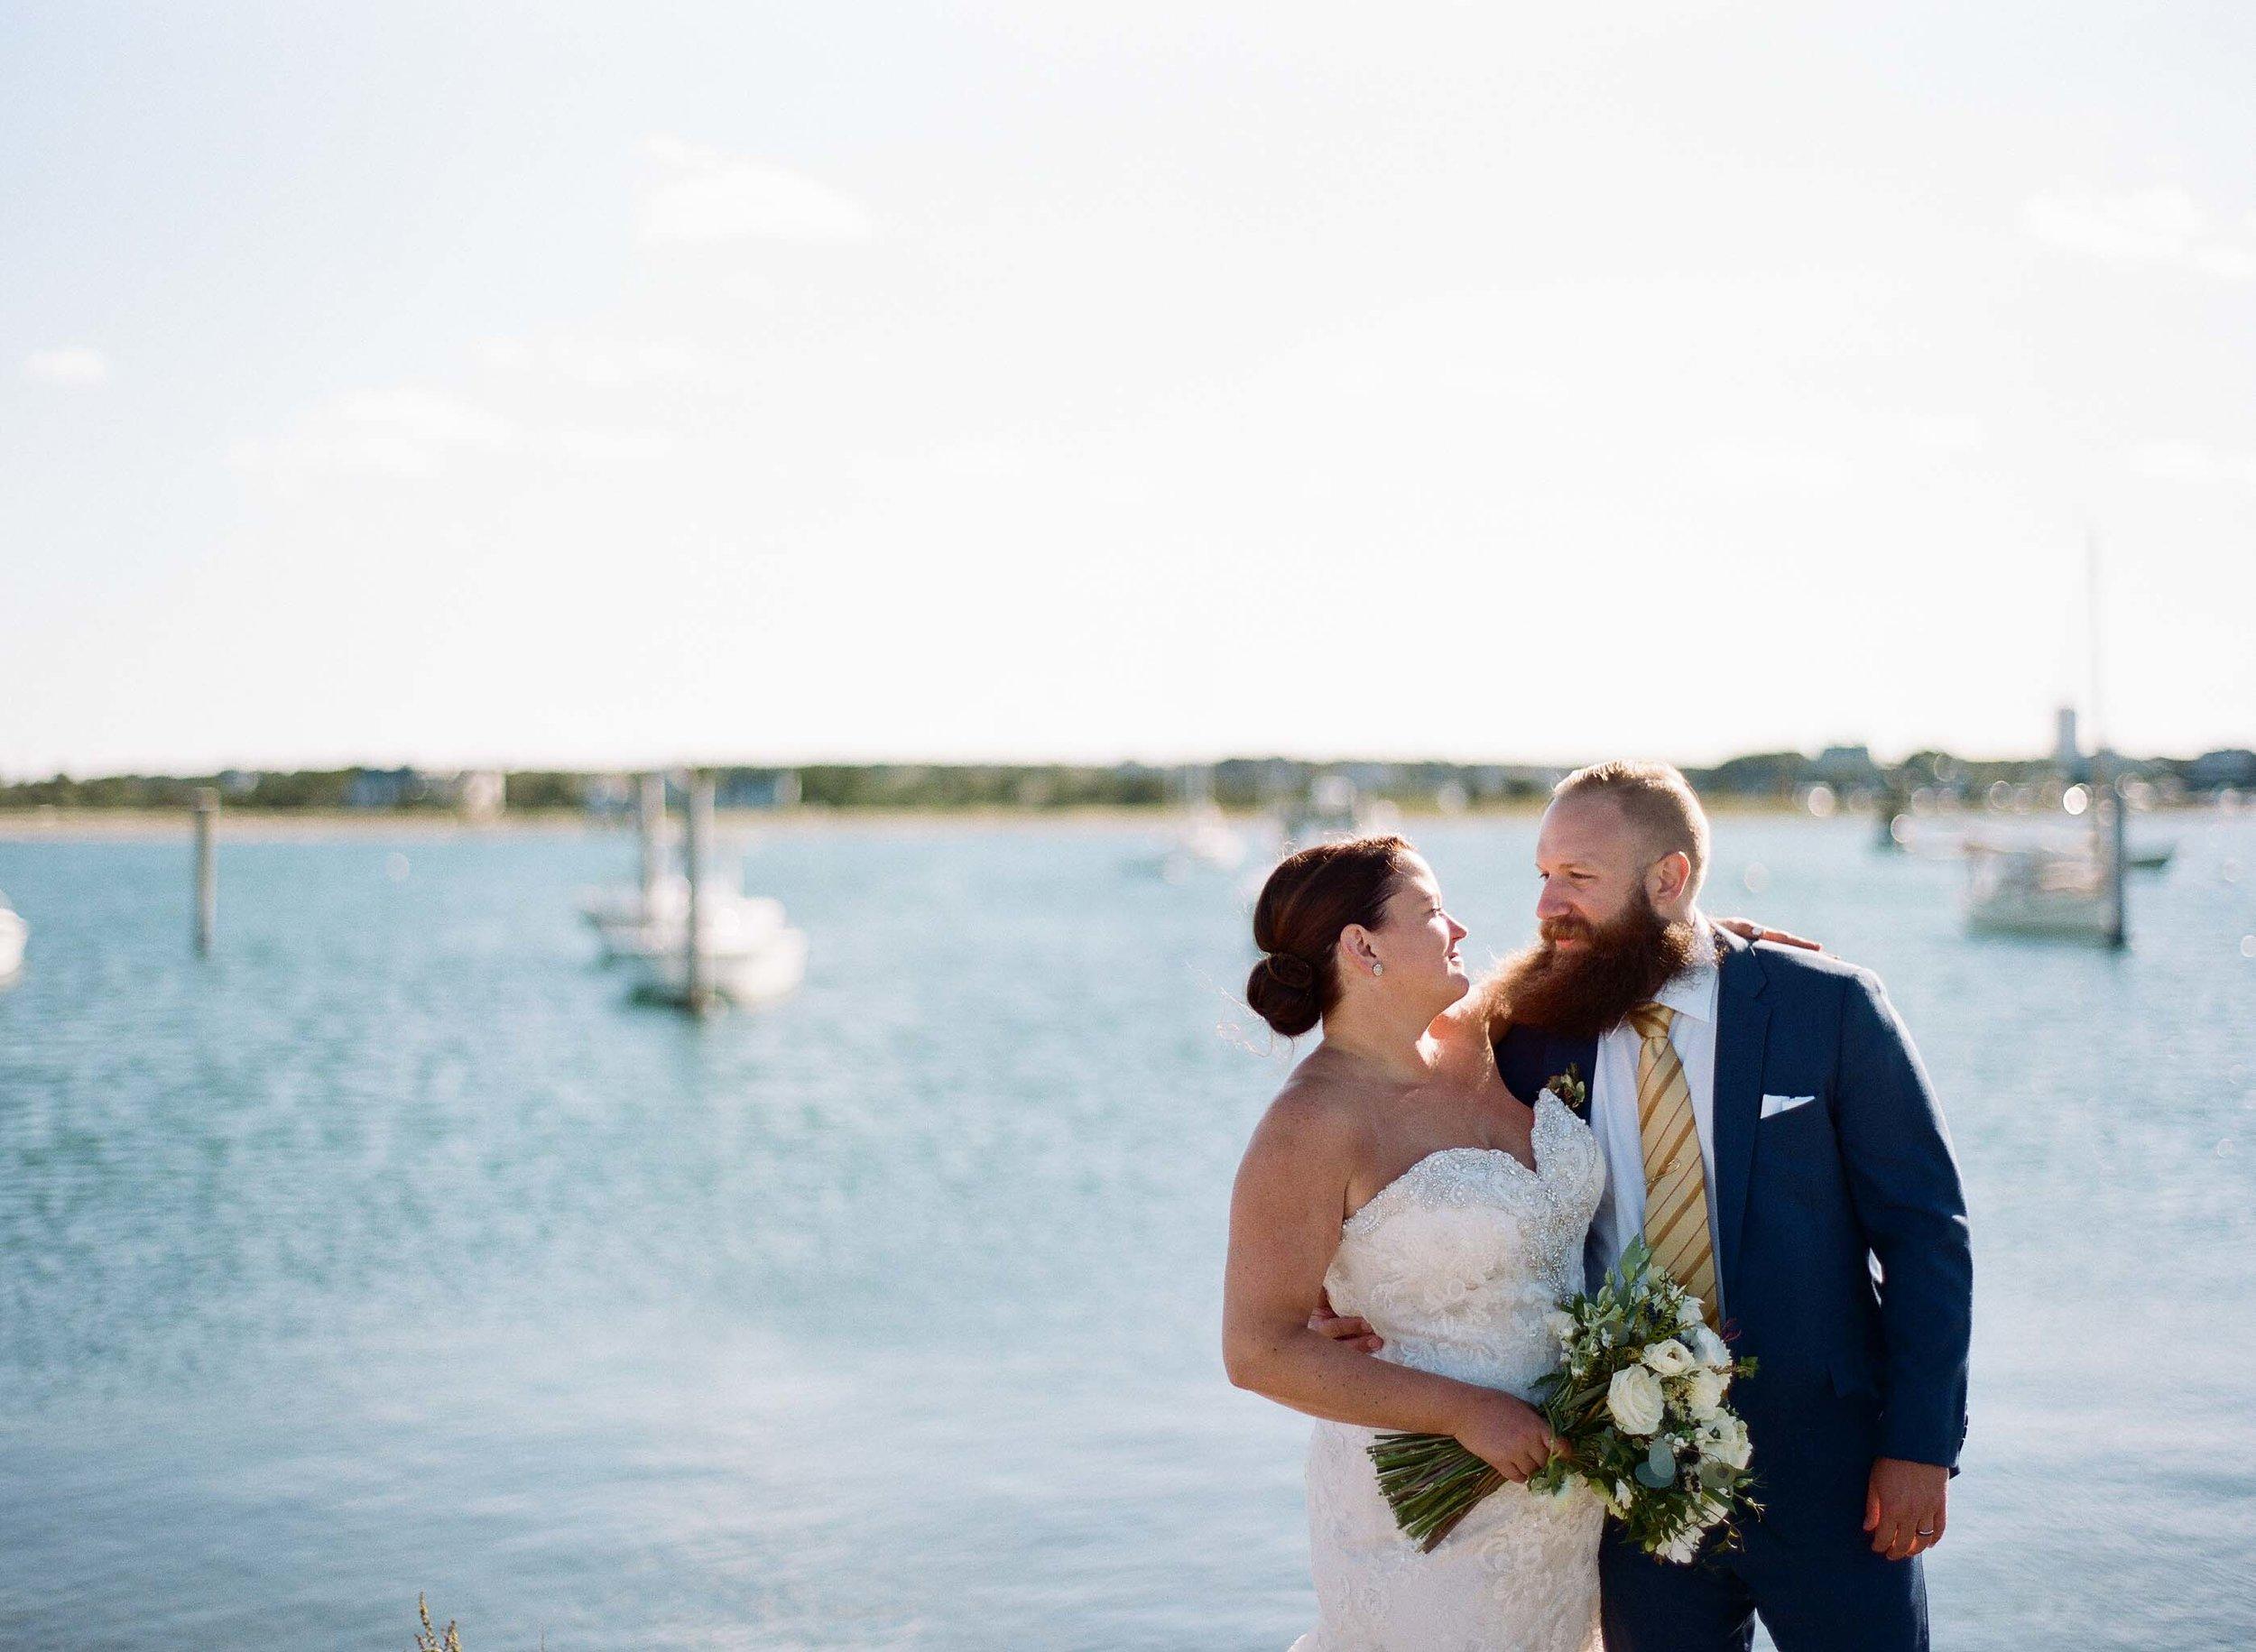 Marthas-vineyard-wedding-37.jpg